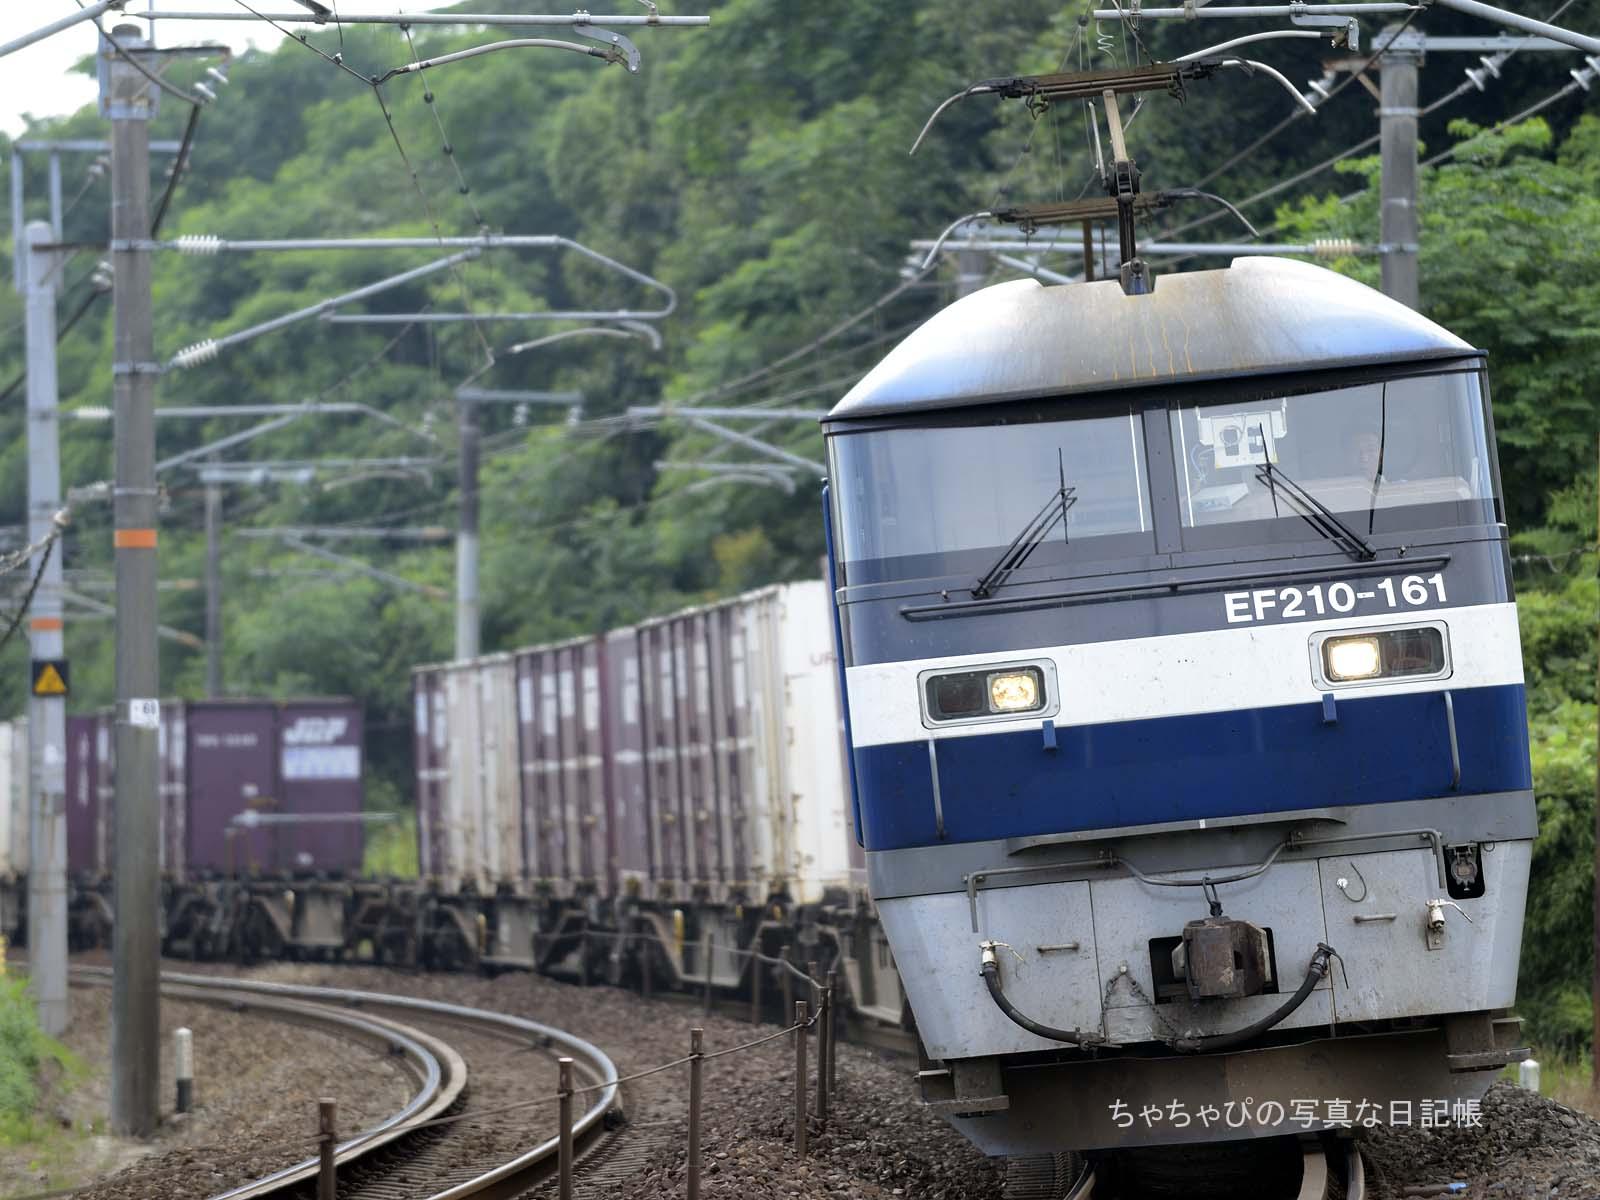 EF210-161